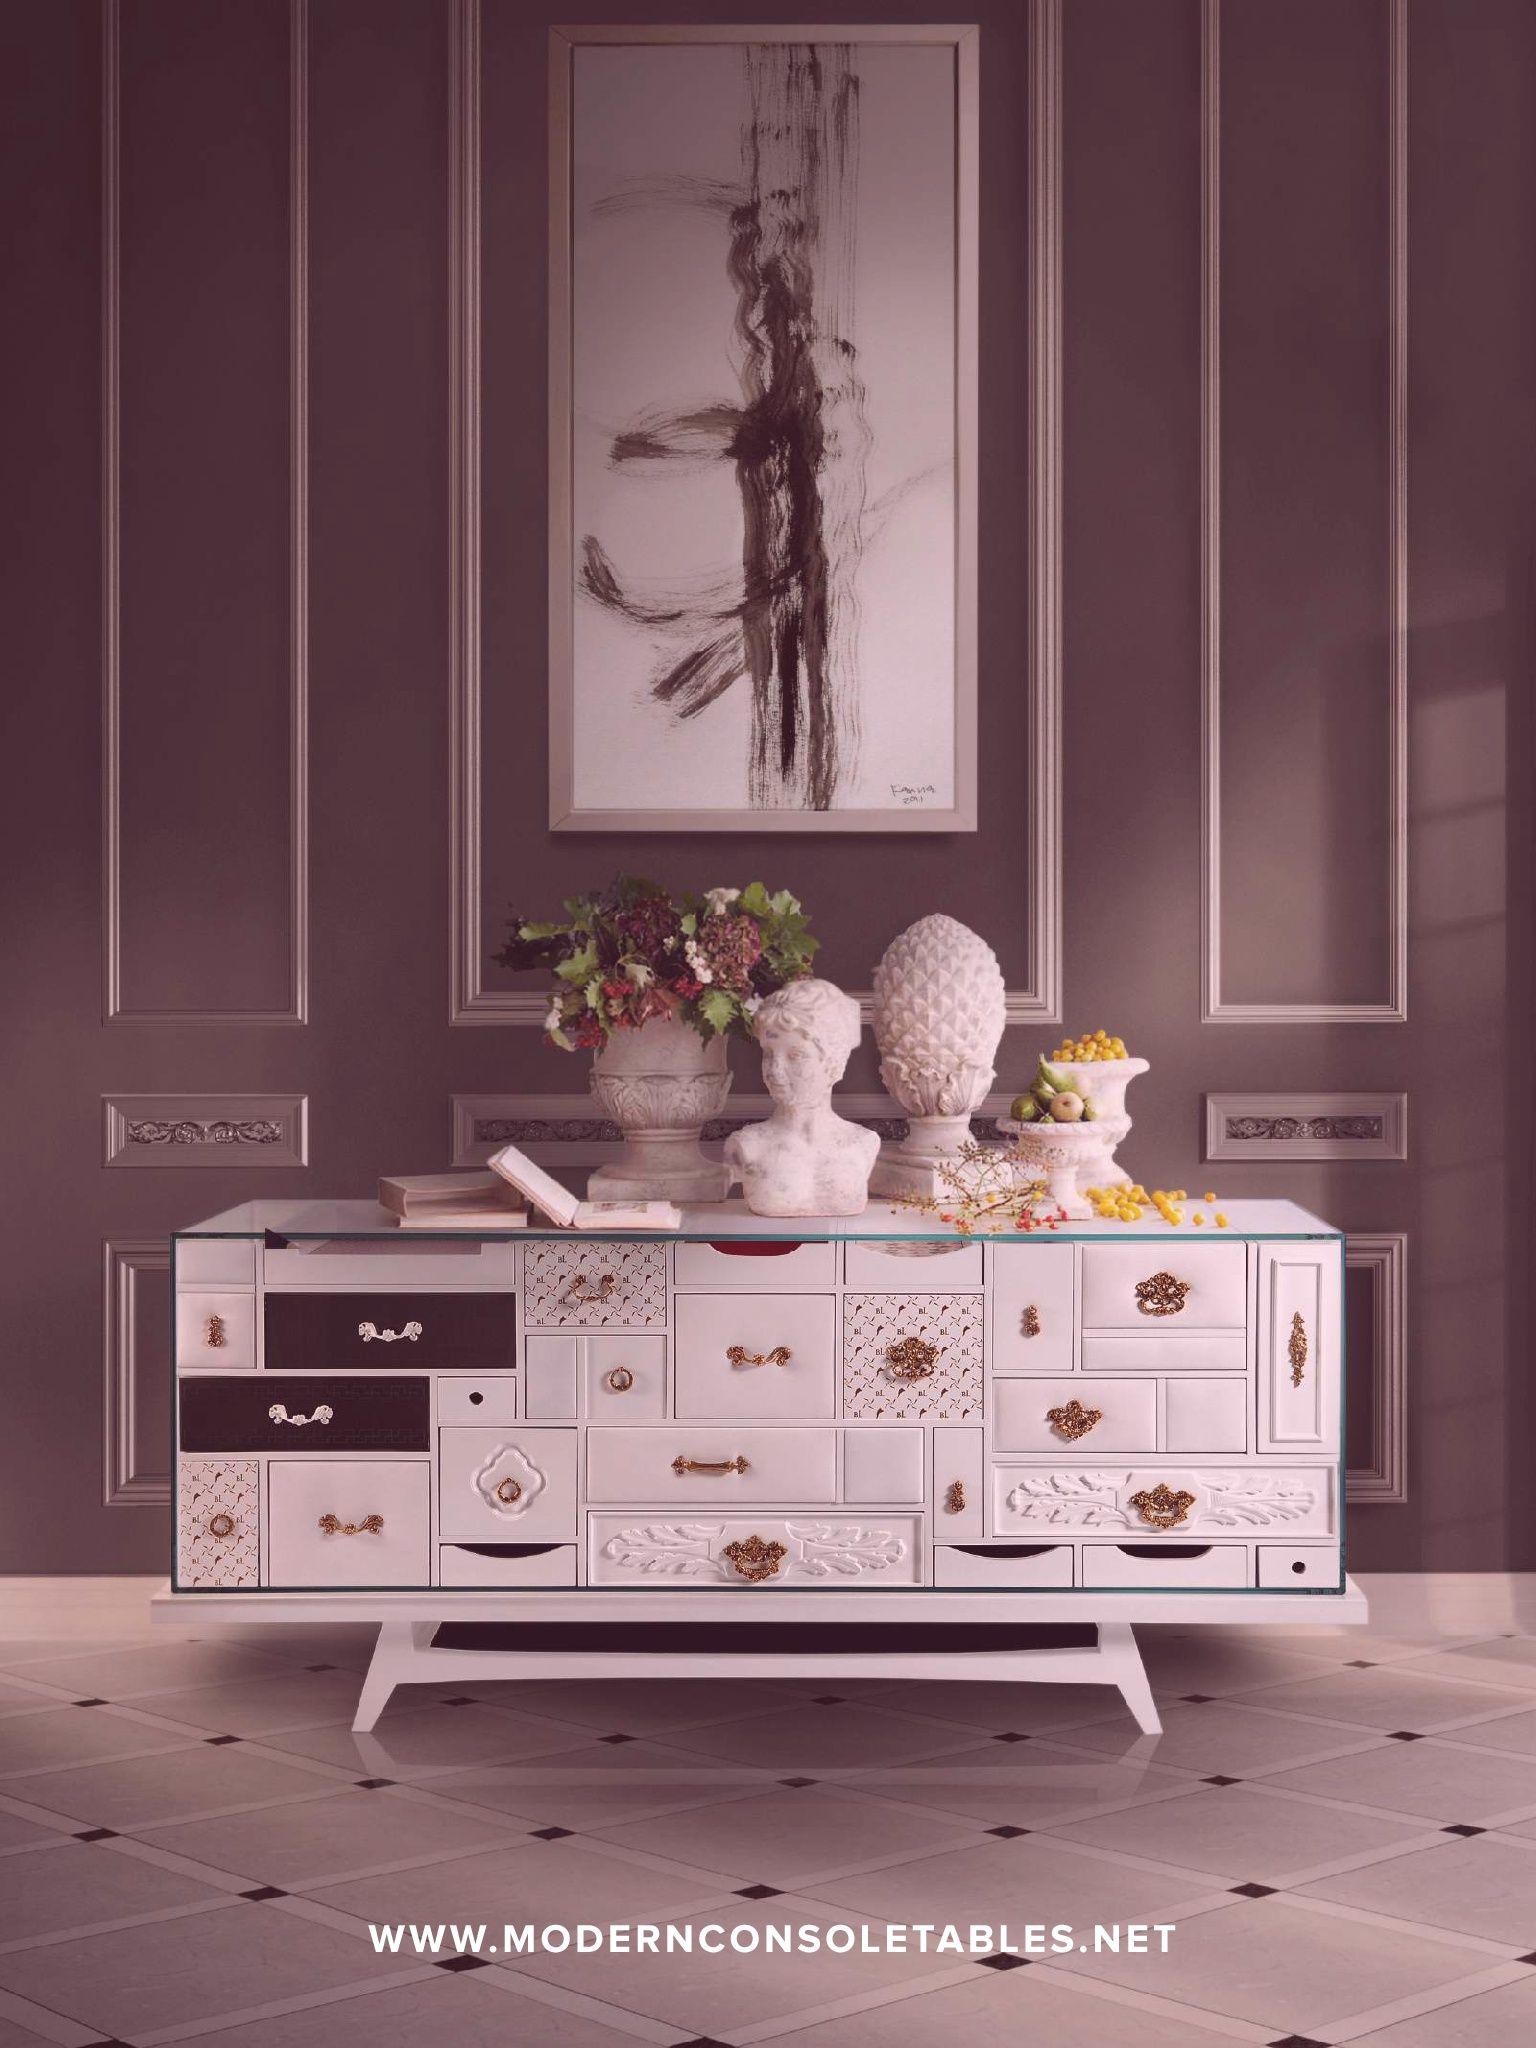 Designer di interni amazing affordable with designer d for Designer d interni famosi